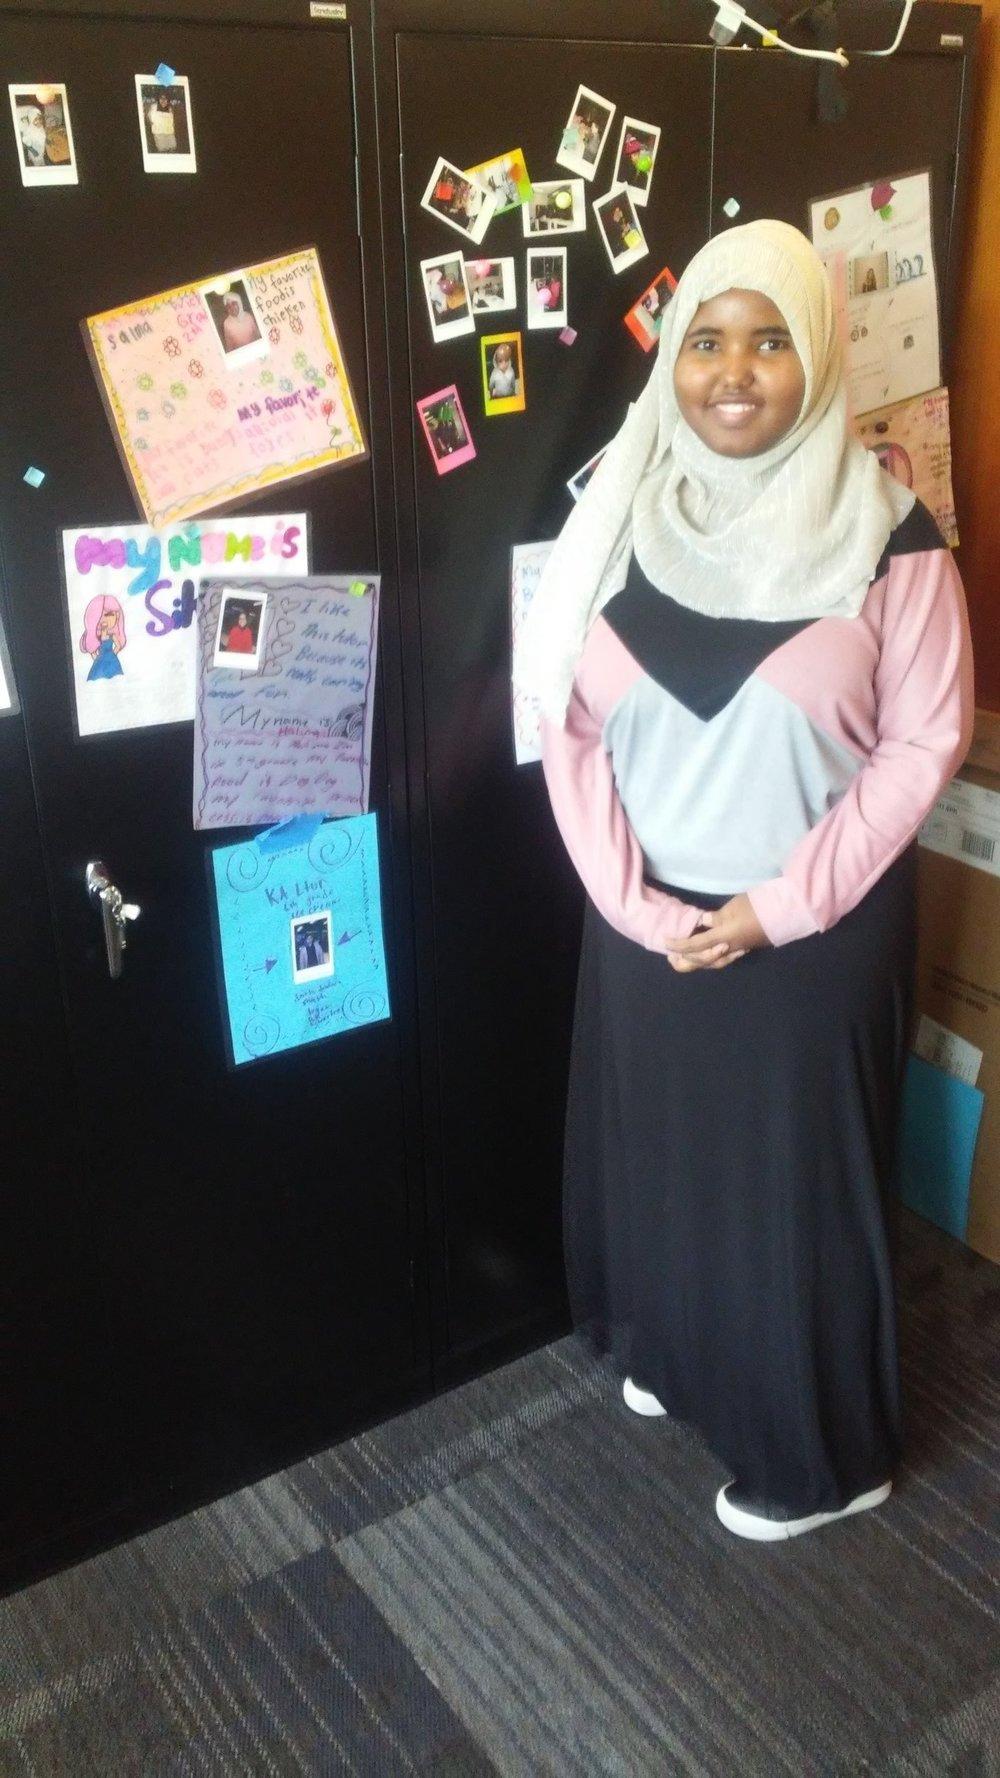 Bilan, Teen Tech Squad member